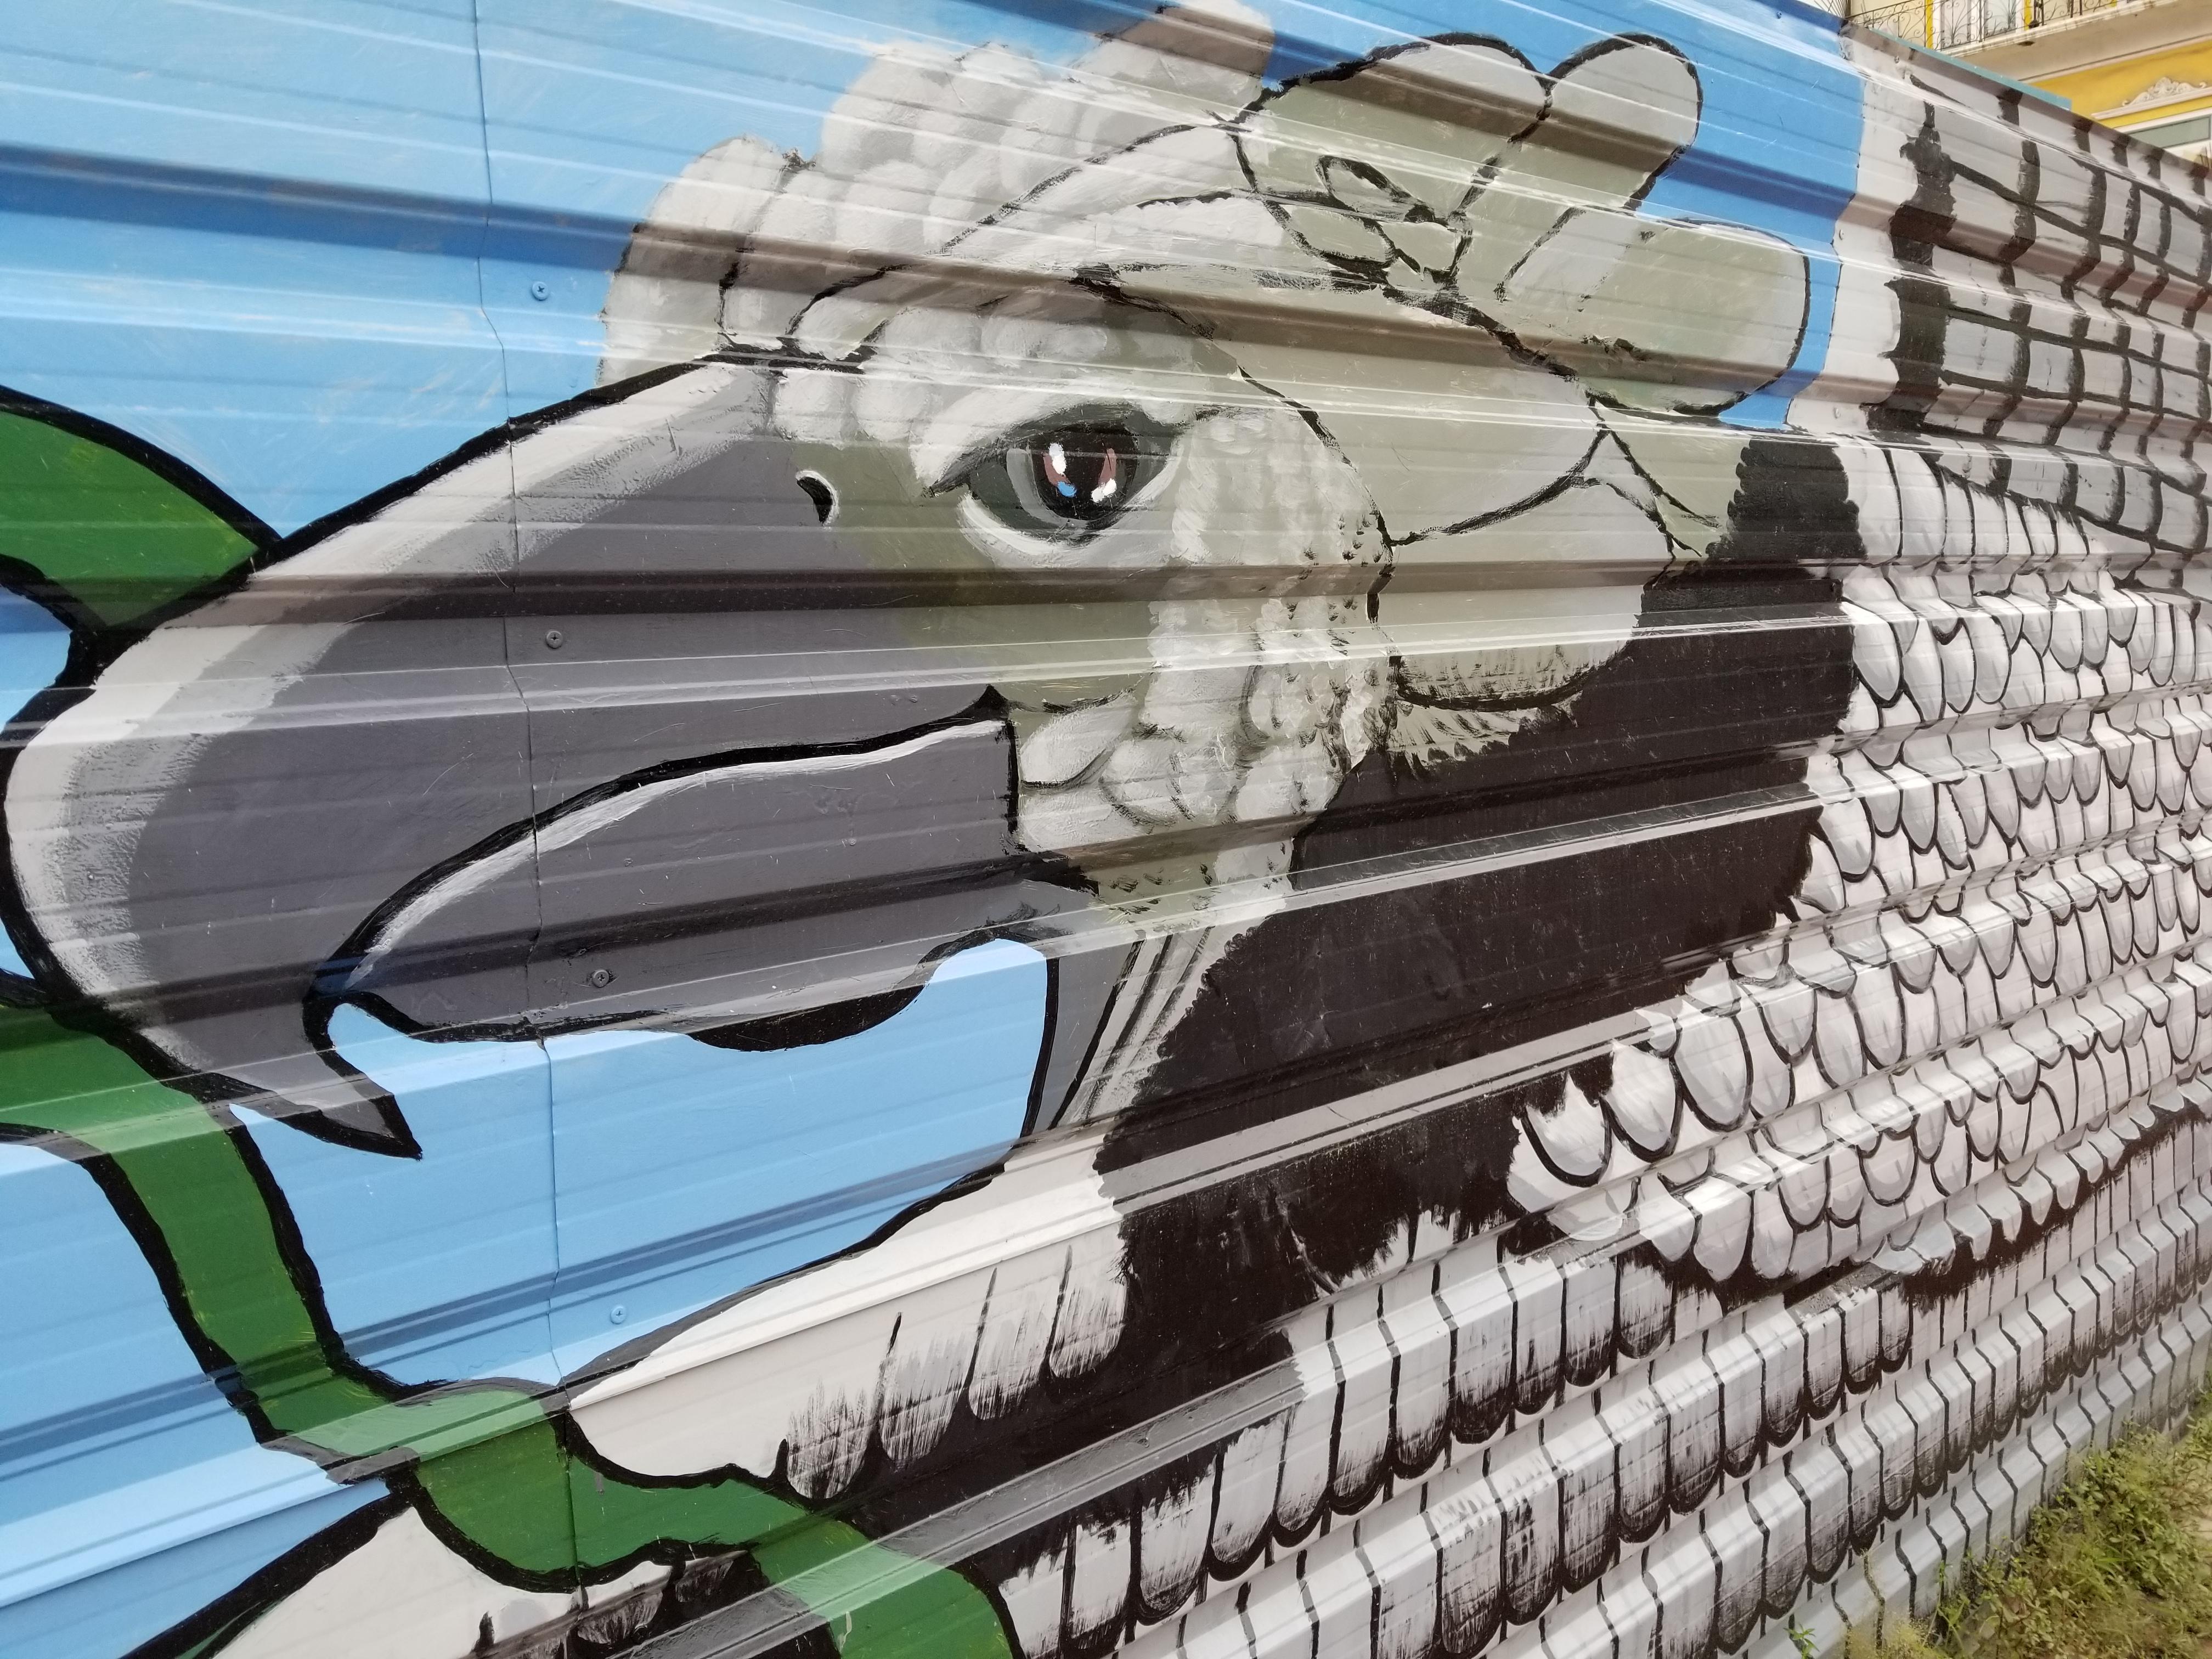 20170528_street_art_harpey_San_Felipe_Panama_City (4)